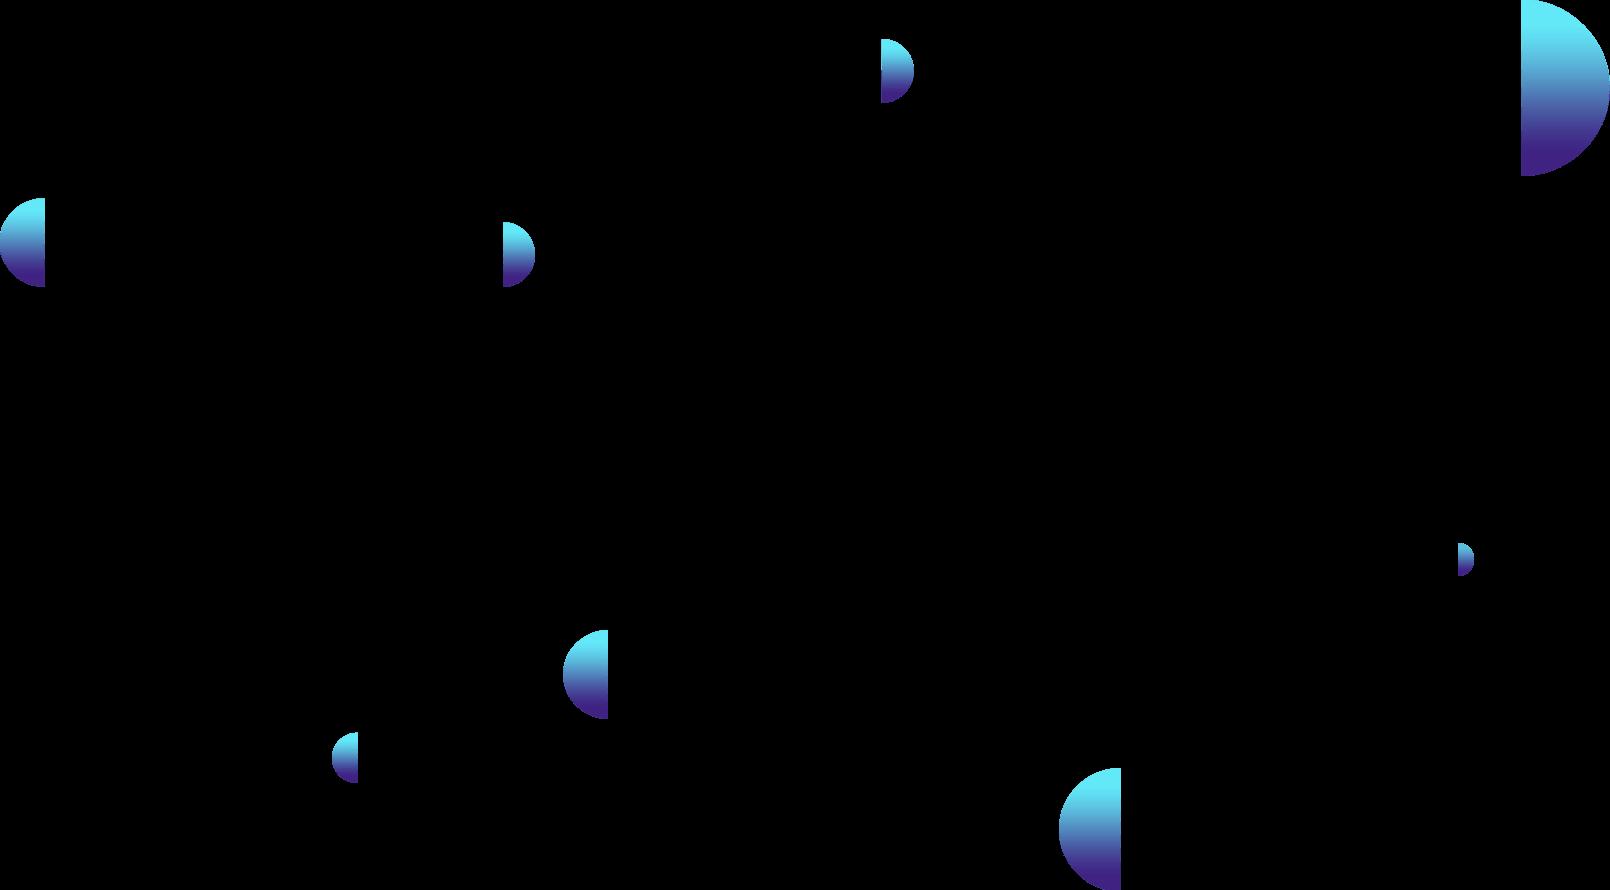 https://shieldltd.gr/wp-content/uploads/2020/10/circle_floaters_03.png